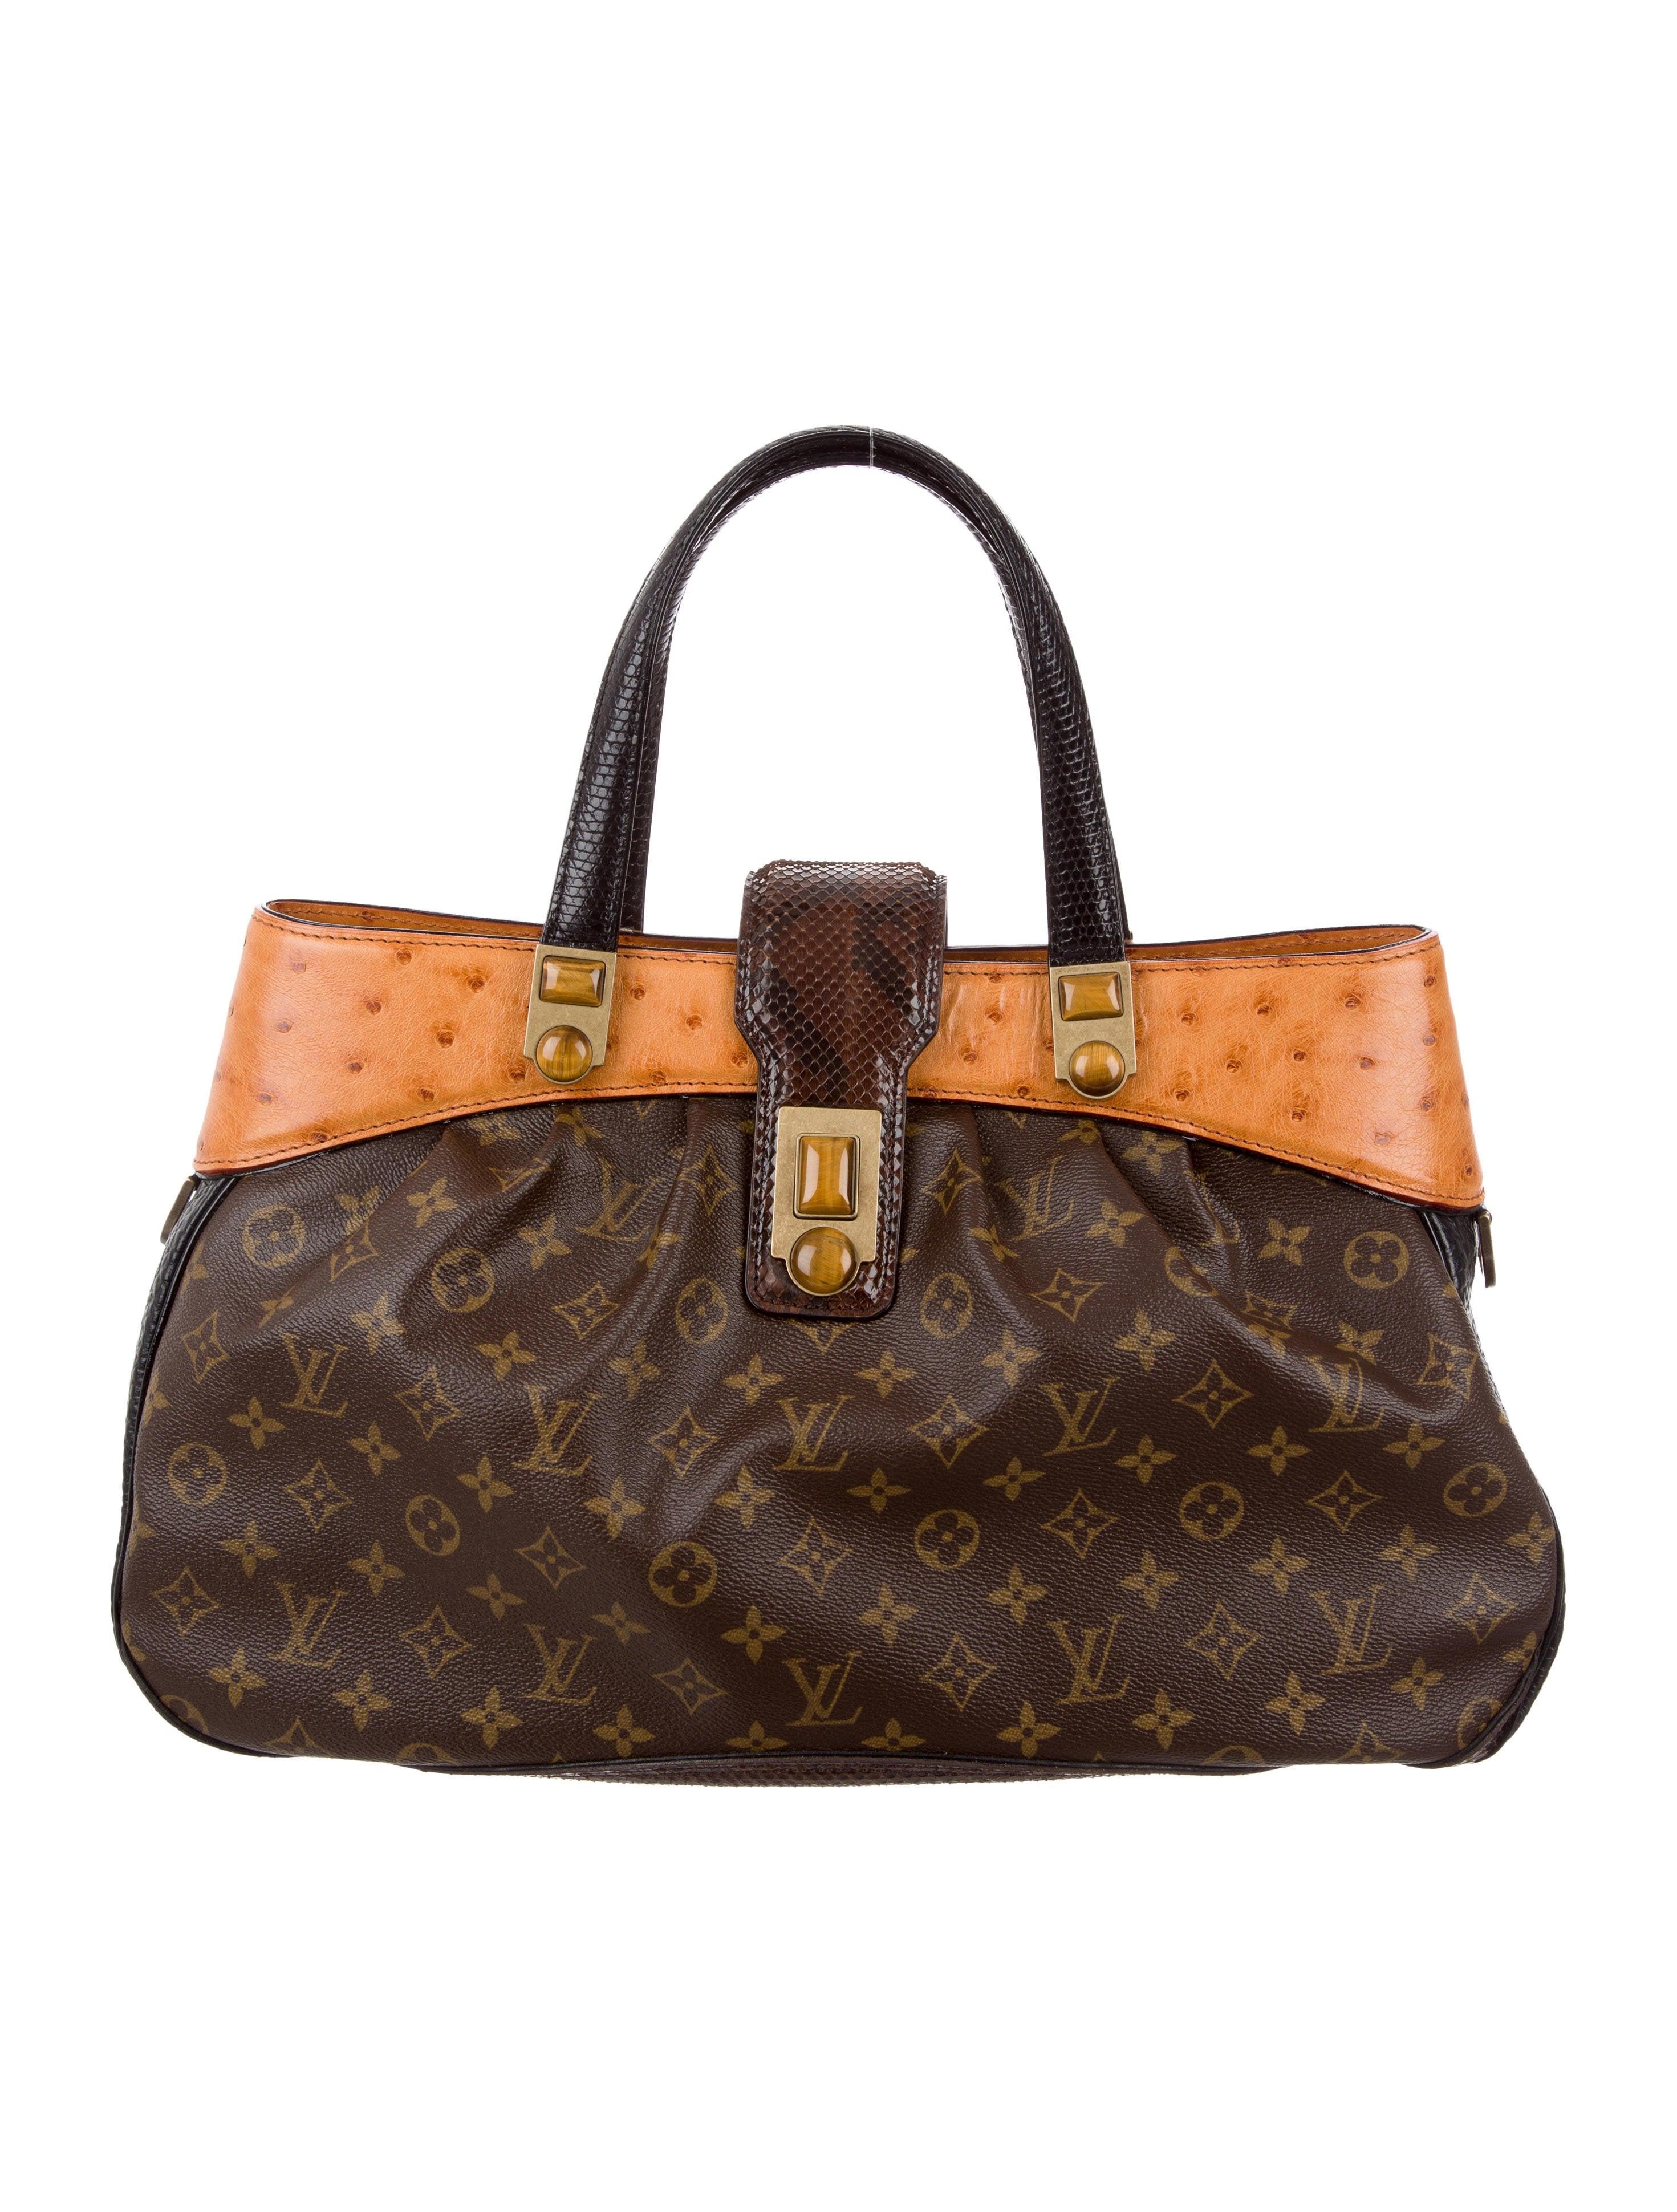 20fd02268f4a Louis Vuitton Handbags